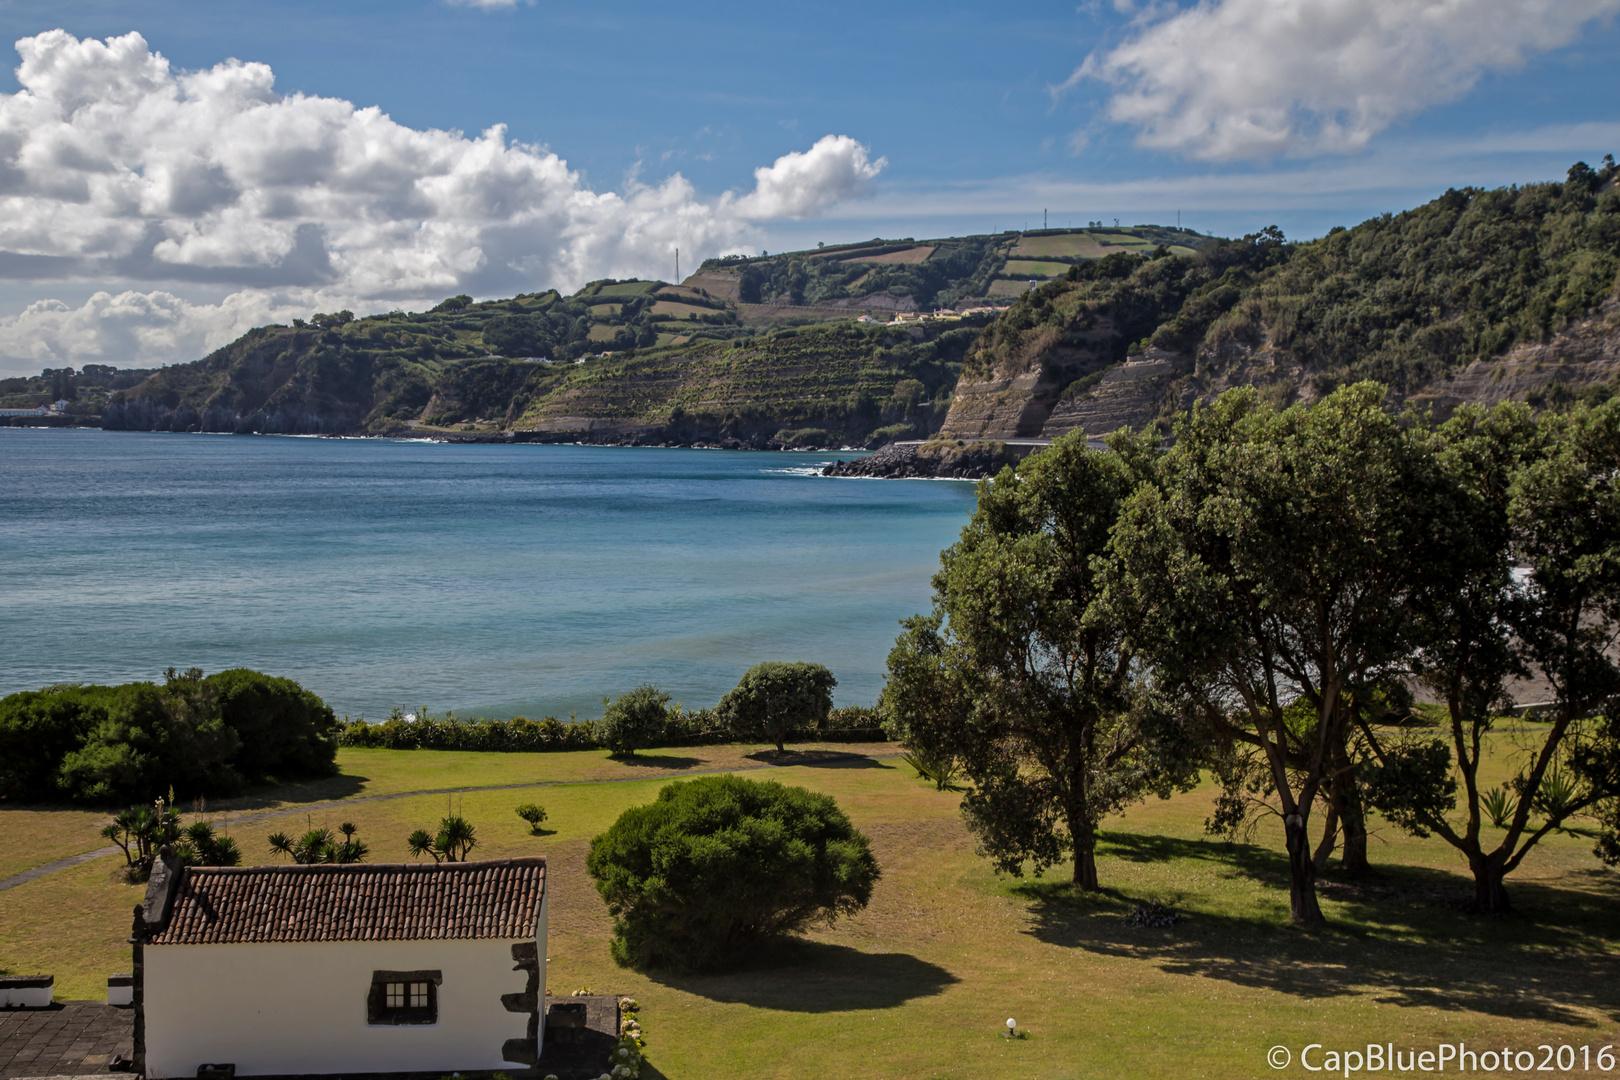 Baia Praia bei Aqua ´Alto (Vila Franca do Campo)